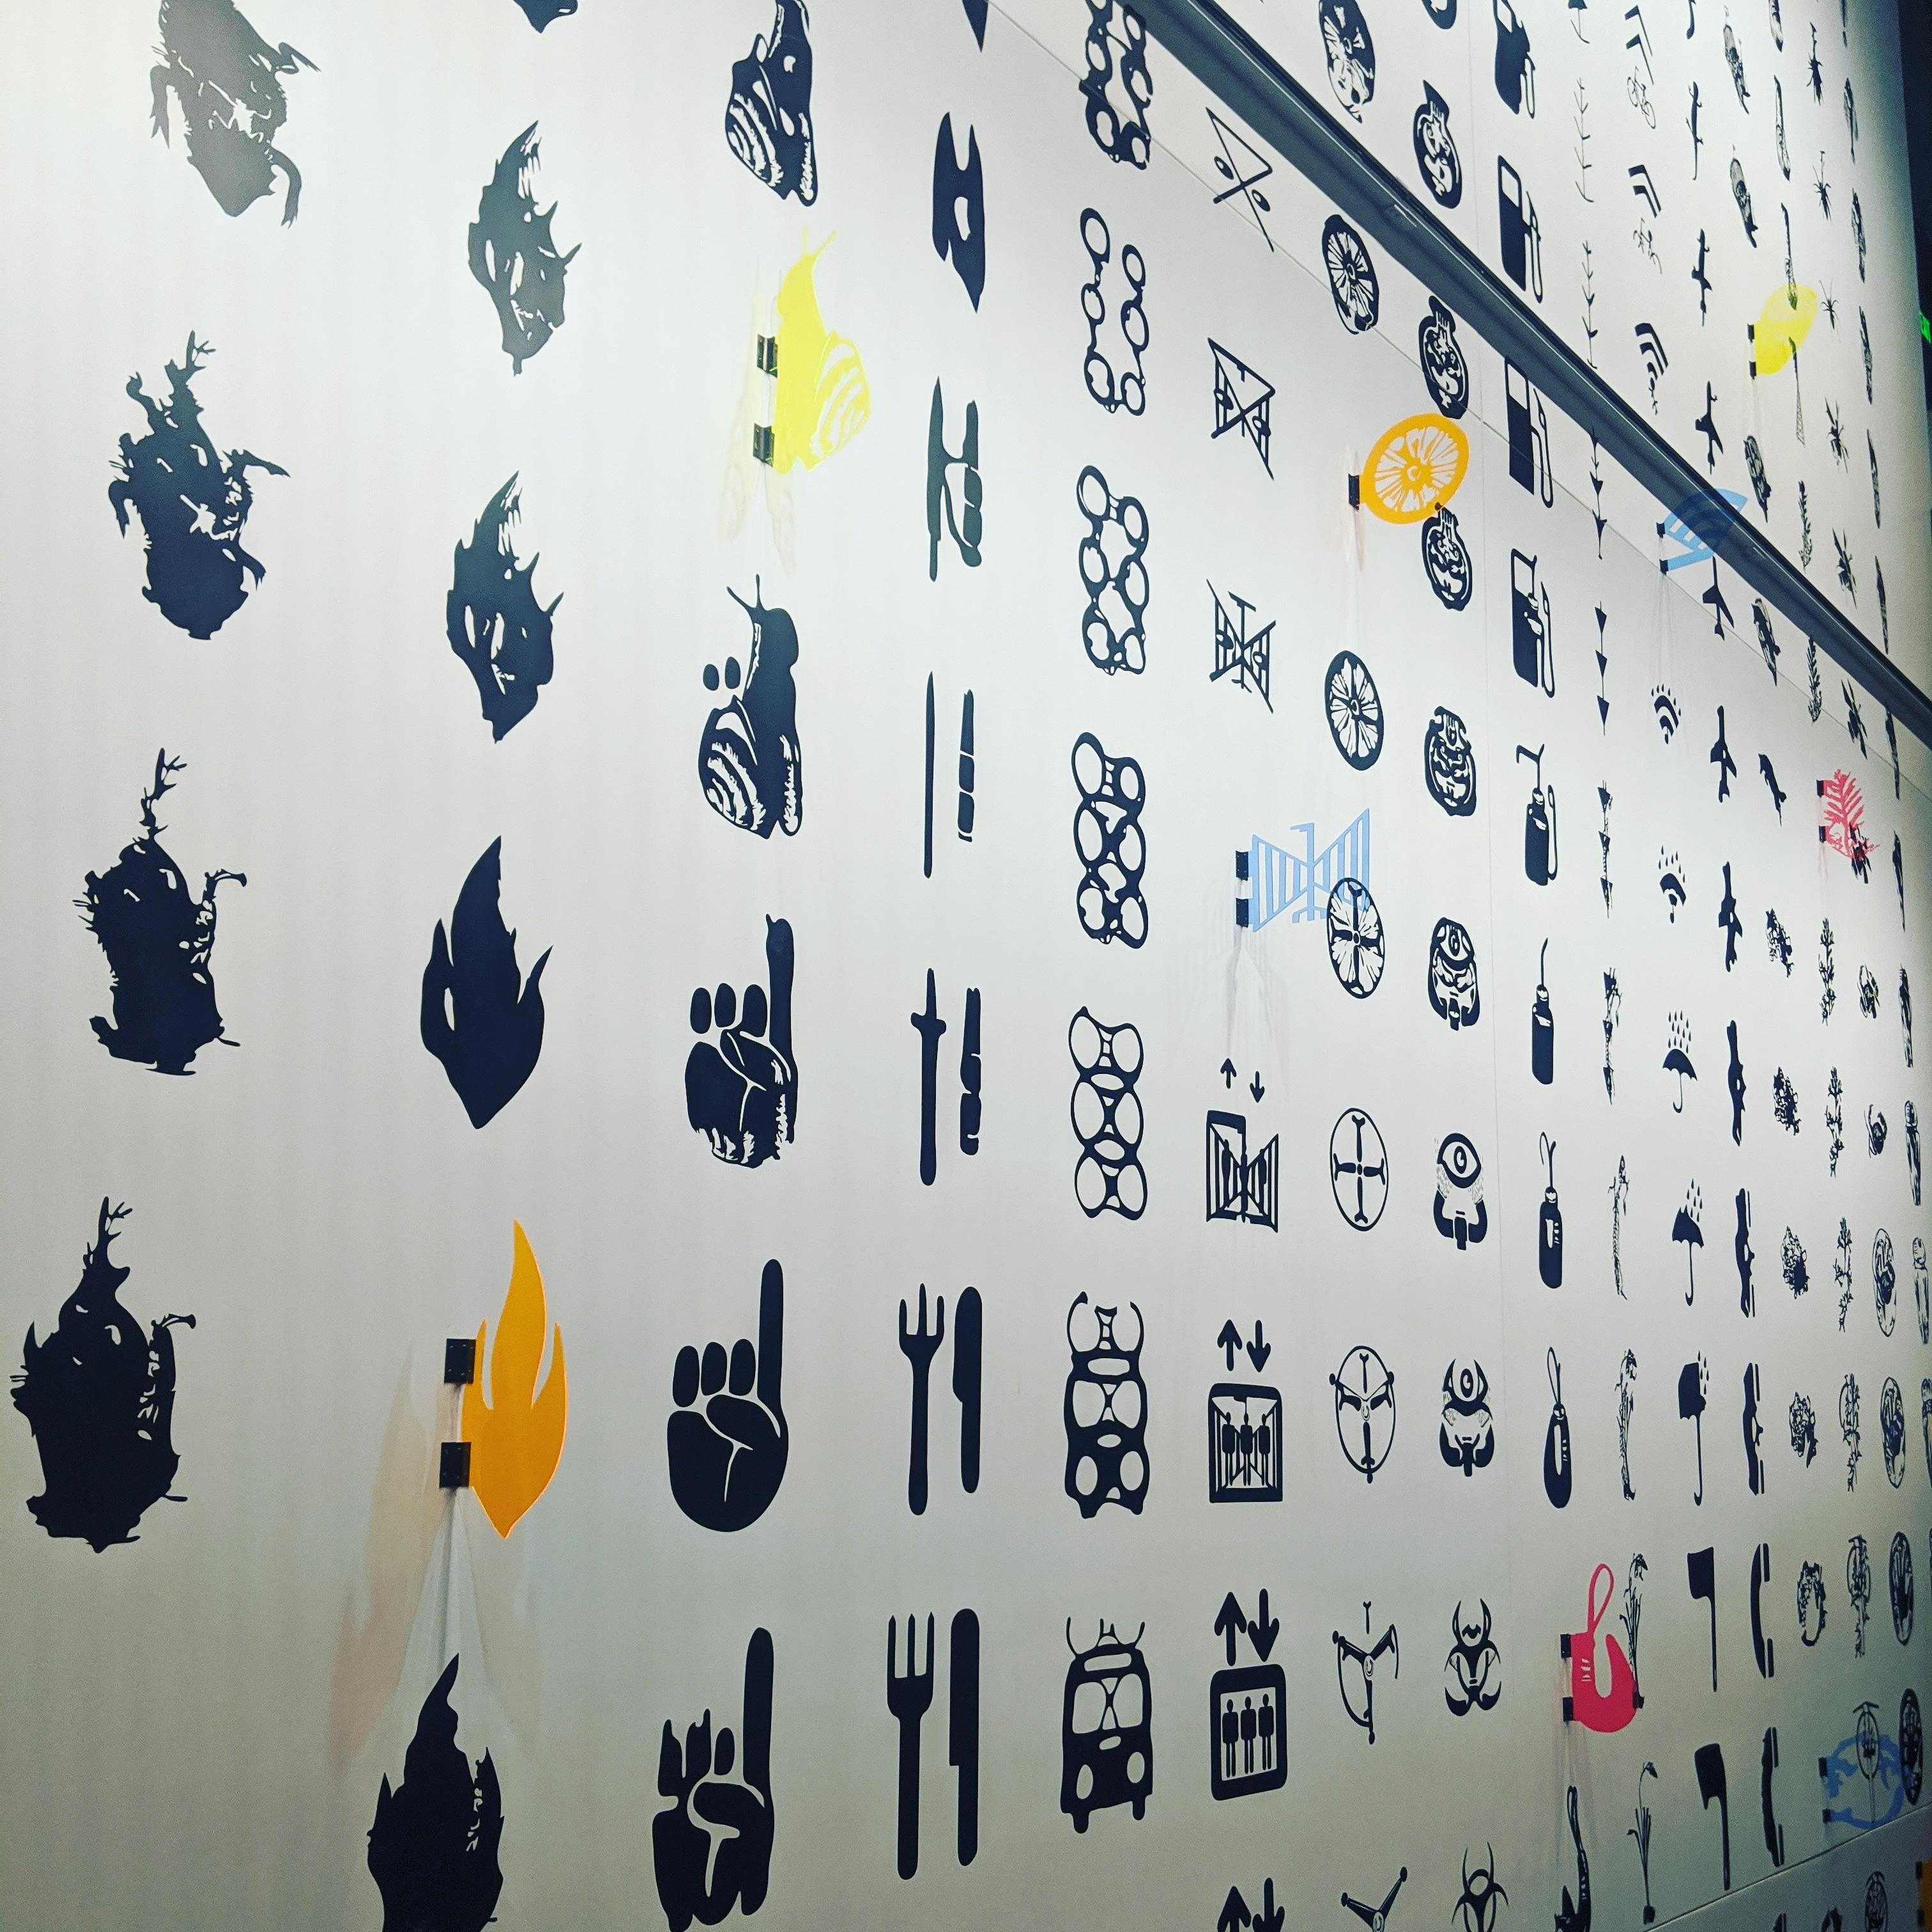 emoji ish symbols escher burke museum seattle aaas